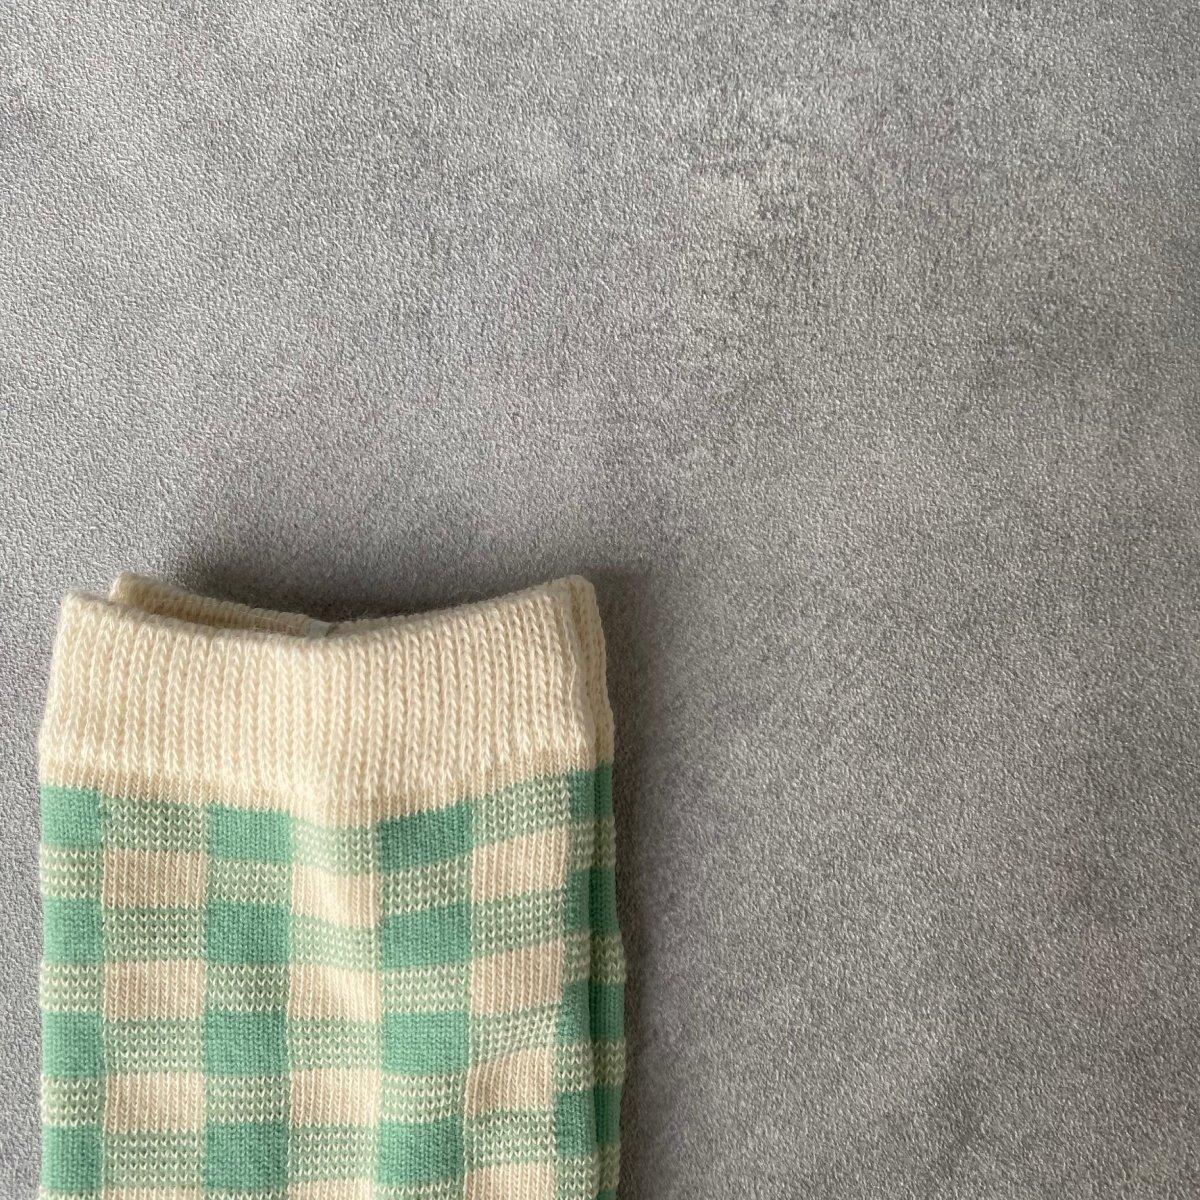 【BABY】Natural Check Socks 詳細画像11